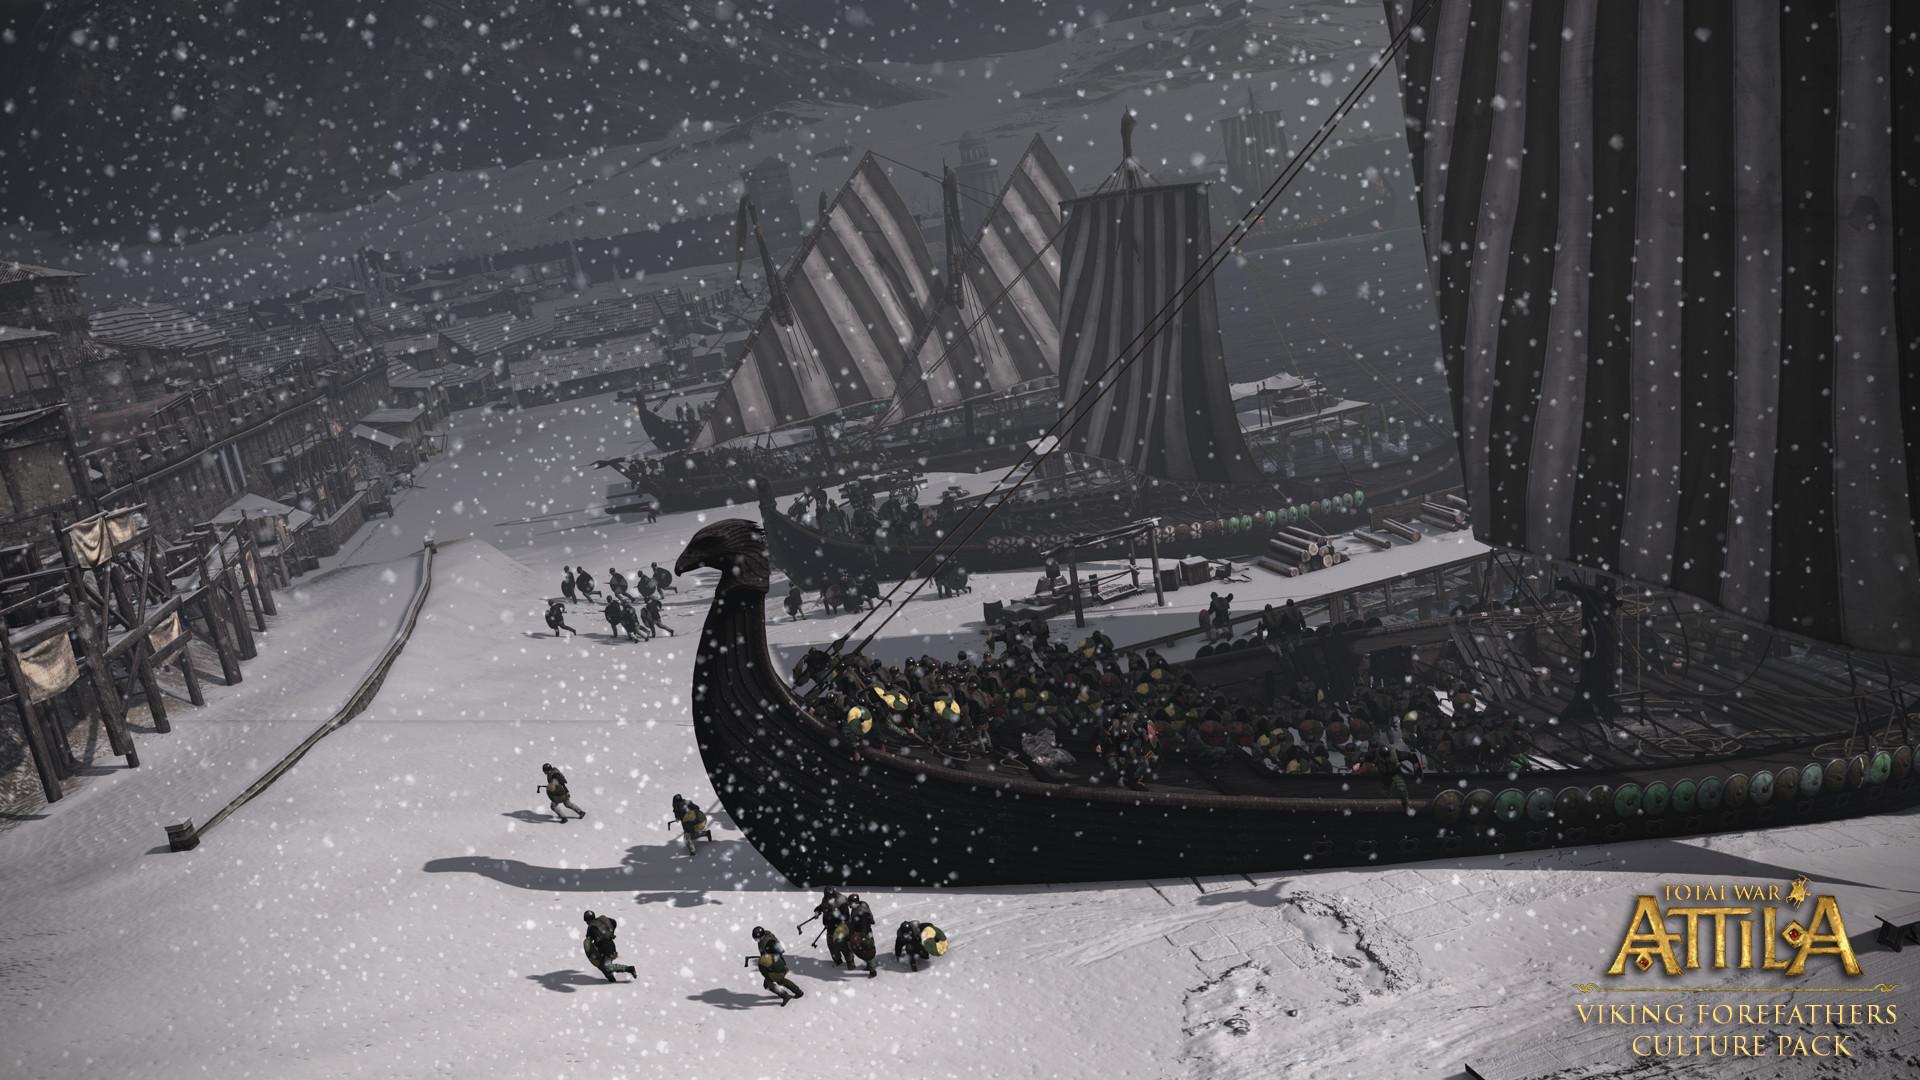 Total War: ATTILA - Viking Forefathers Culture Pack Fiyat Karşılaştırma